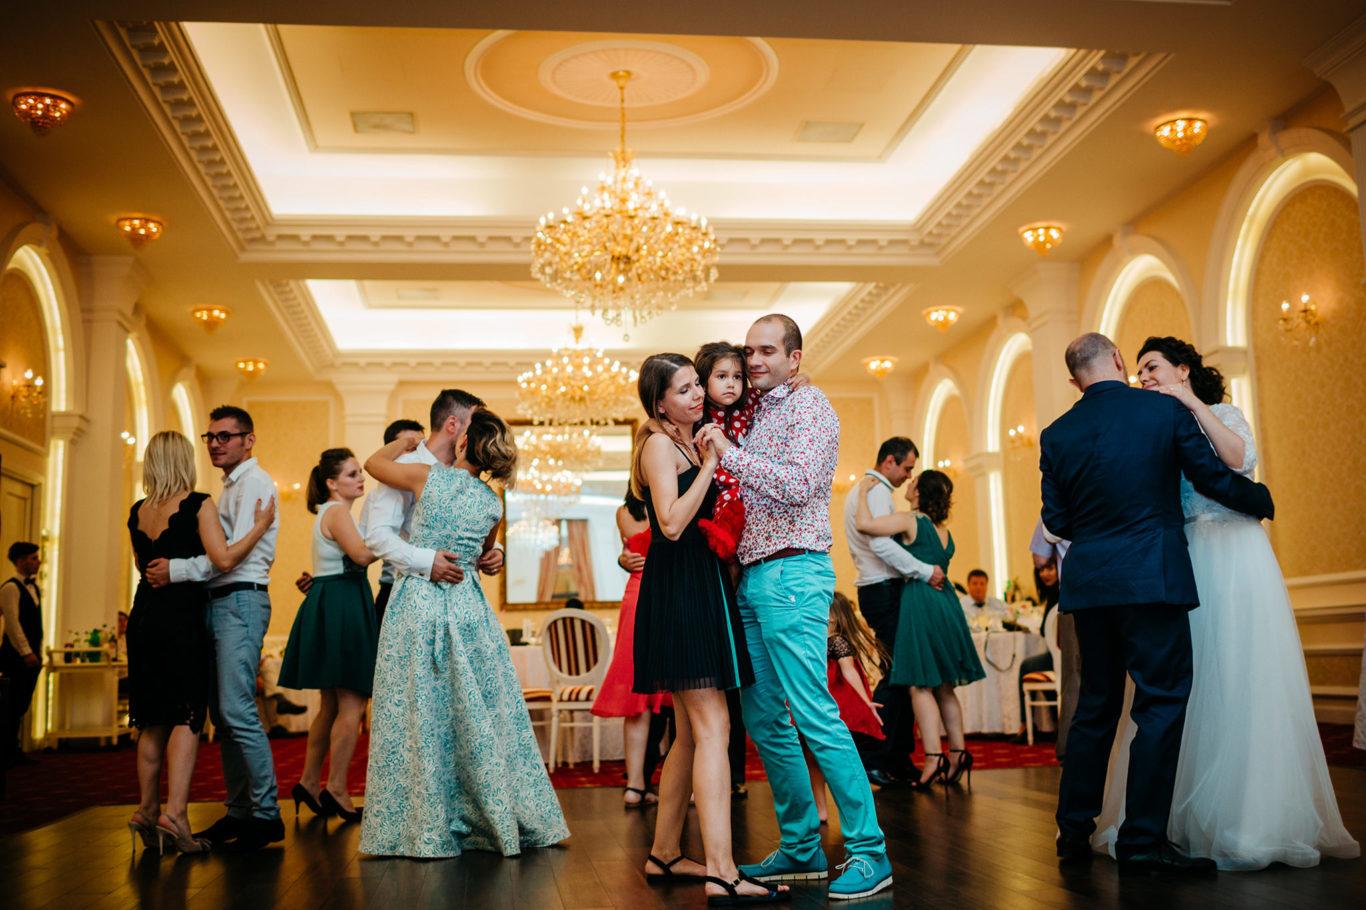 0757-fotografie-nunta-bucuresti-anca-george-fotograf-ciprian-dumitrescu-dcf_6260